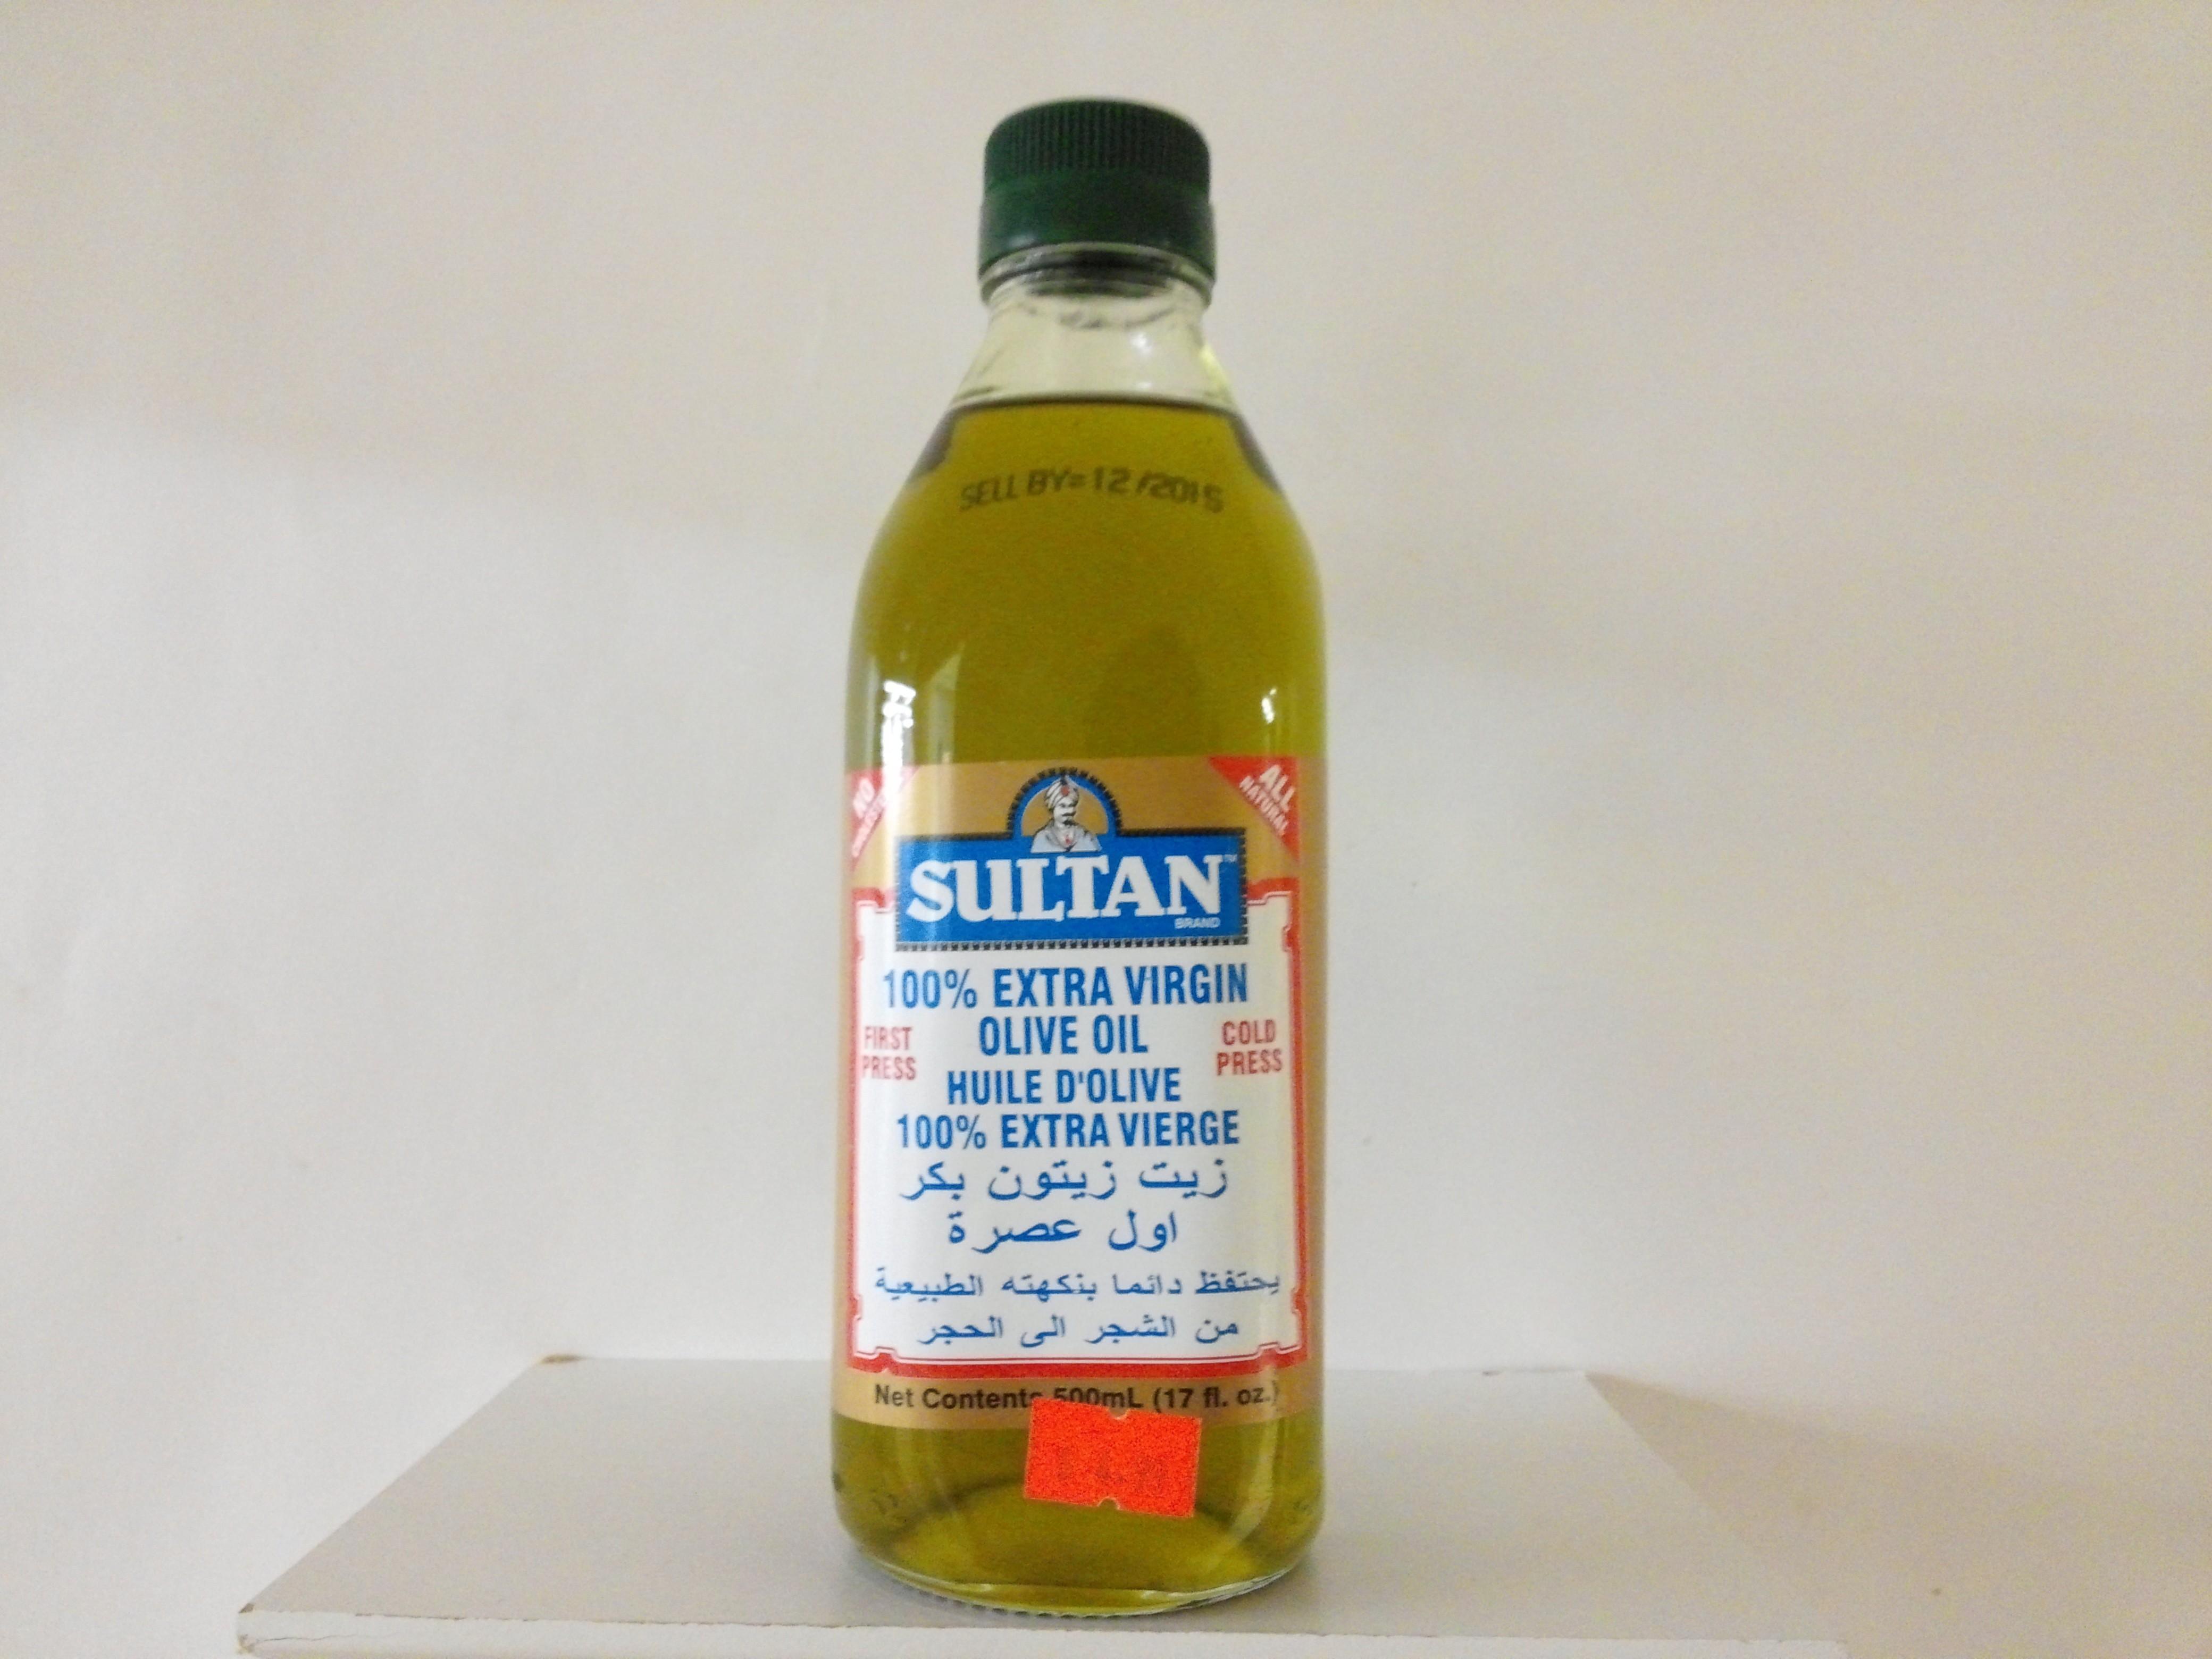 Sultan 100% Extra Virgin Olive Oil 17 oz